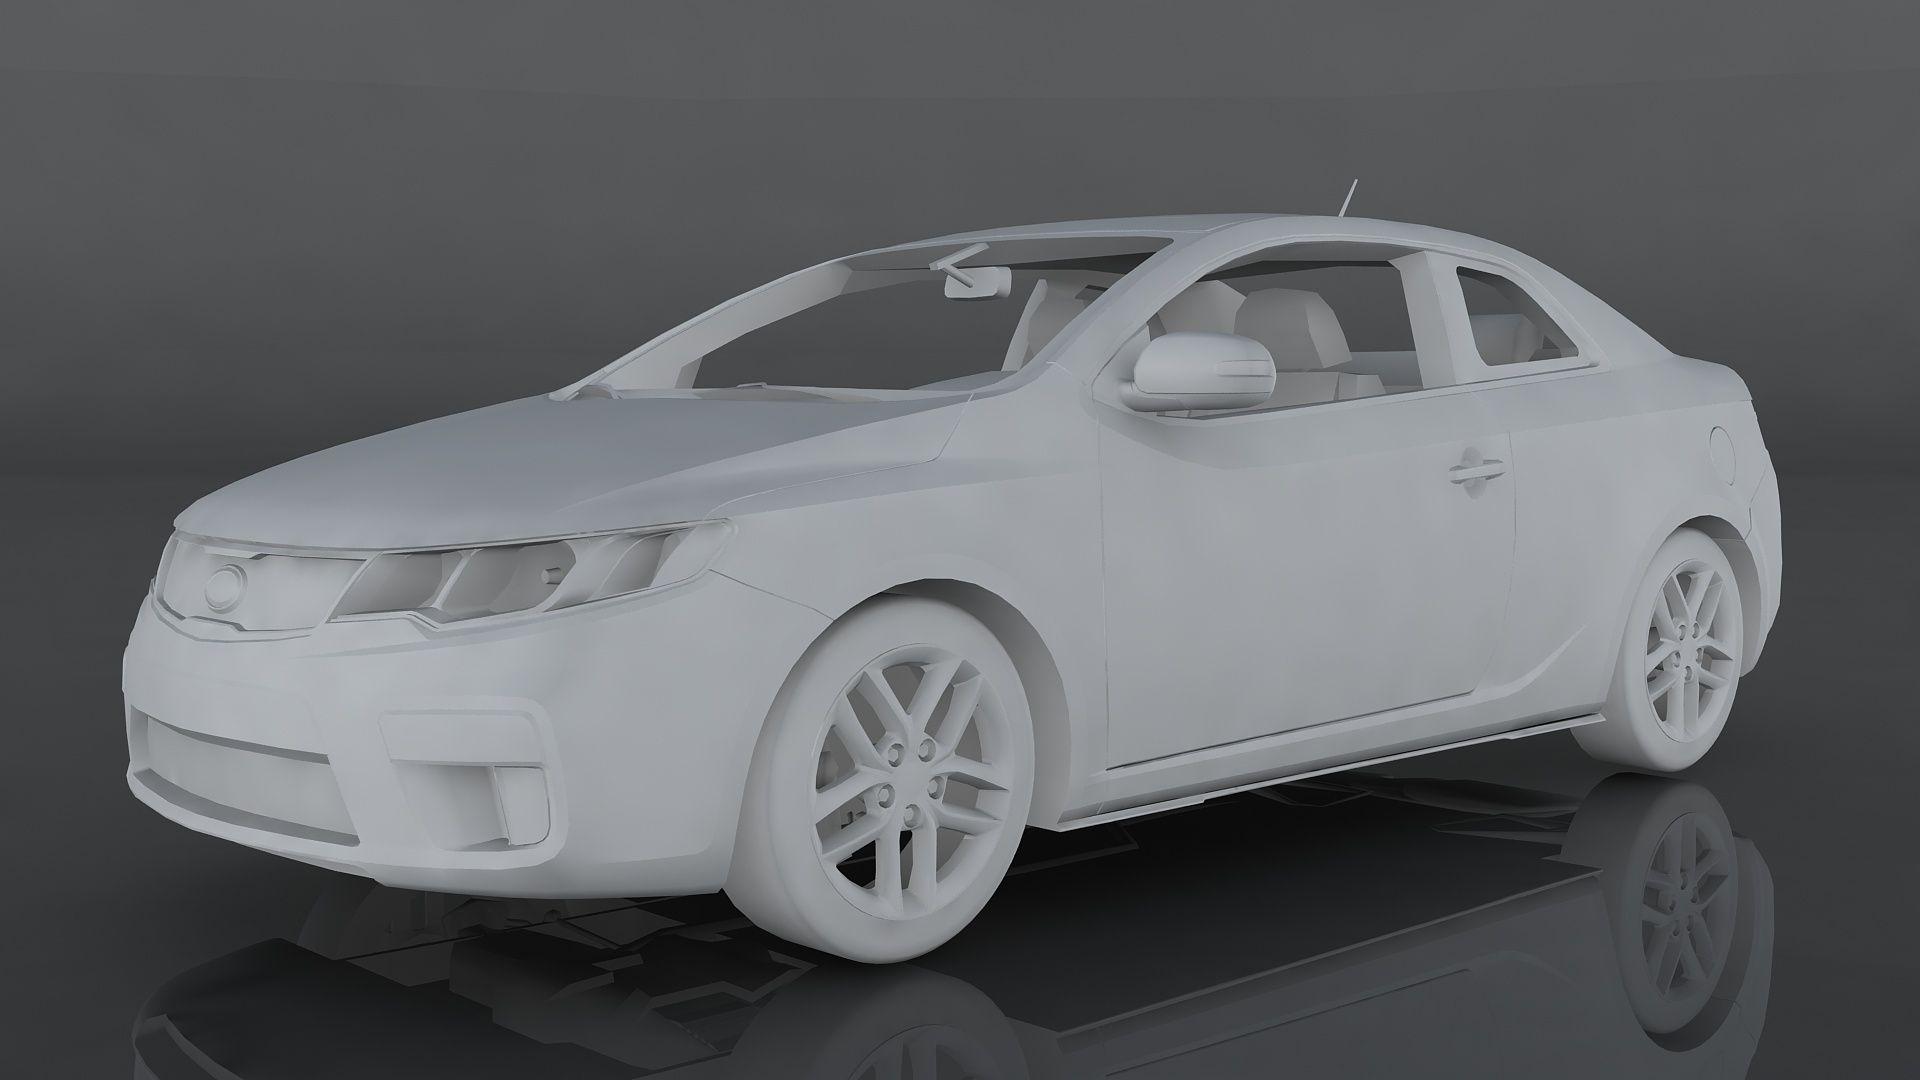 Kia Forte Koup Sx In 2020 Kia Forte Kia Low Poly 3d Models